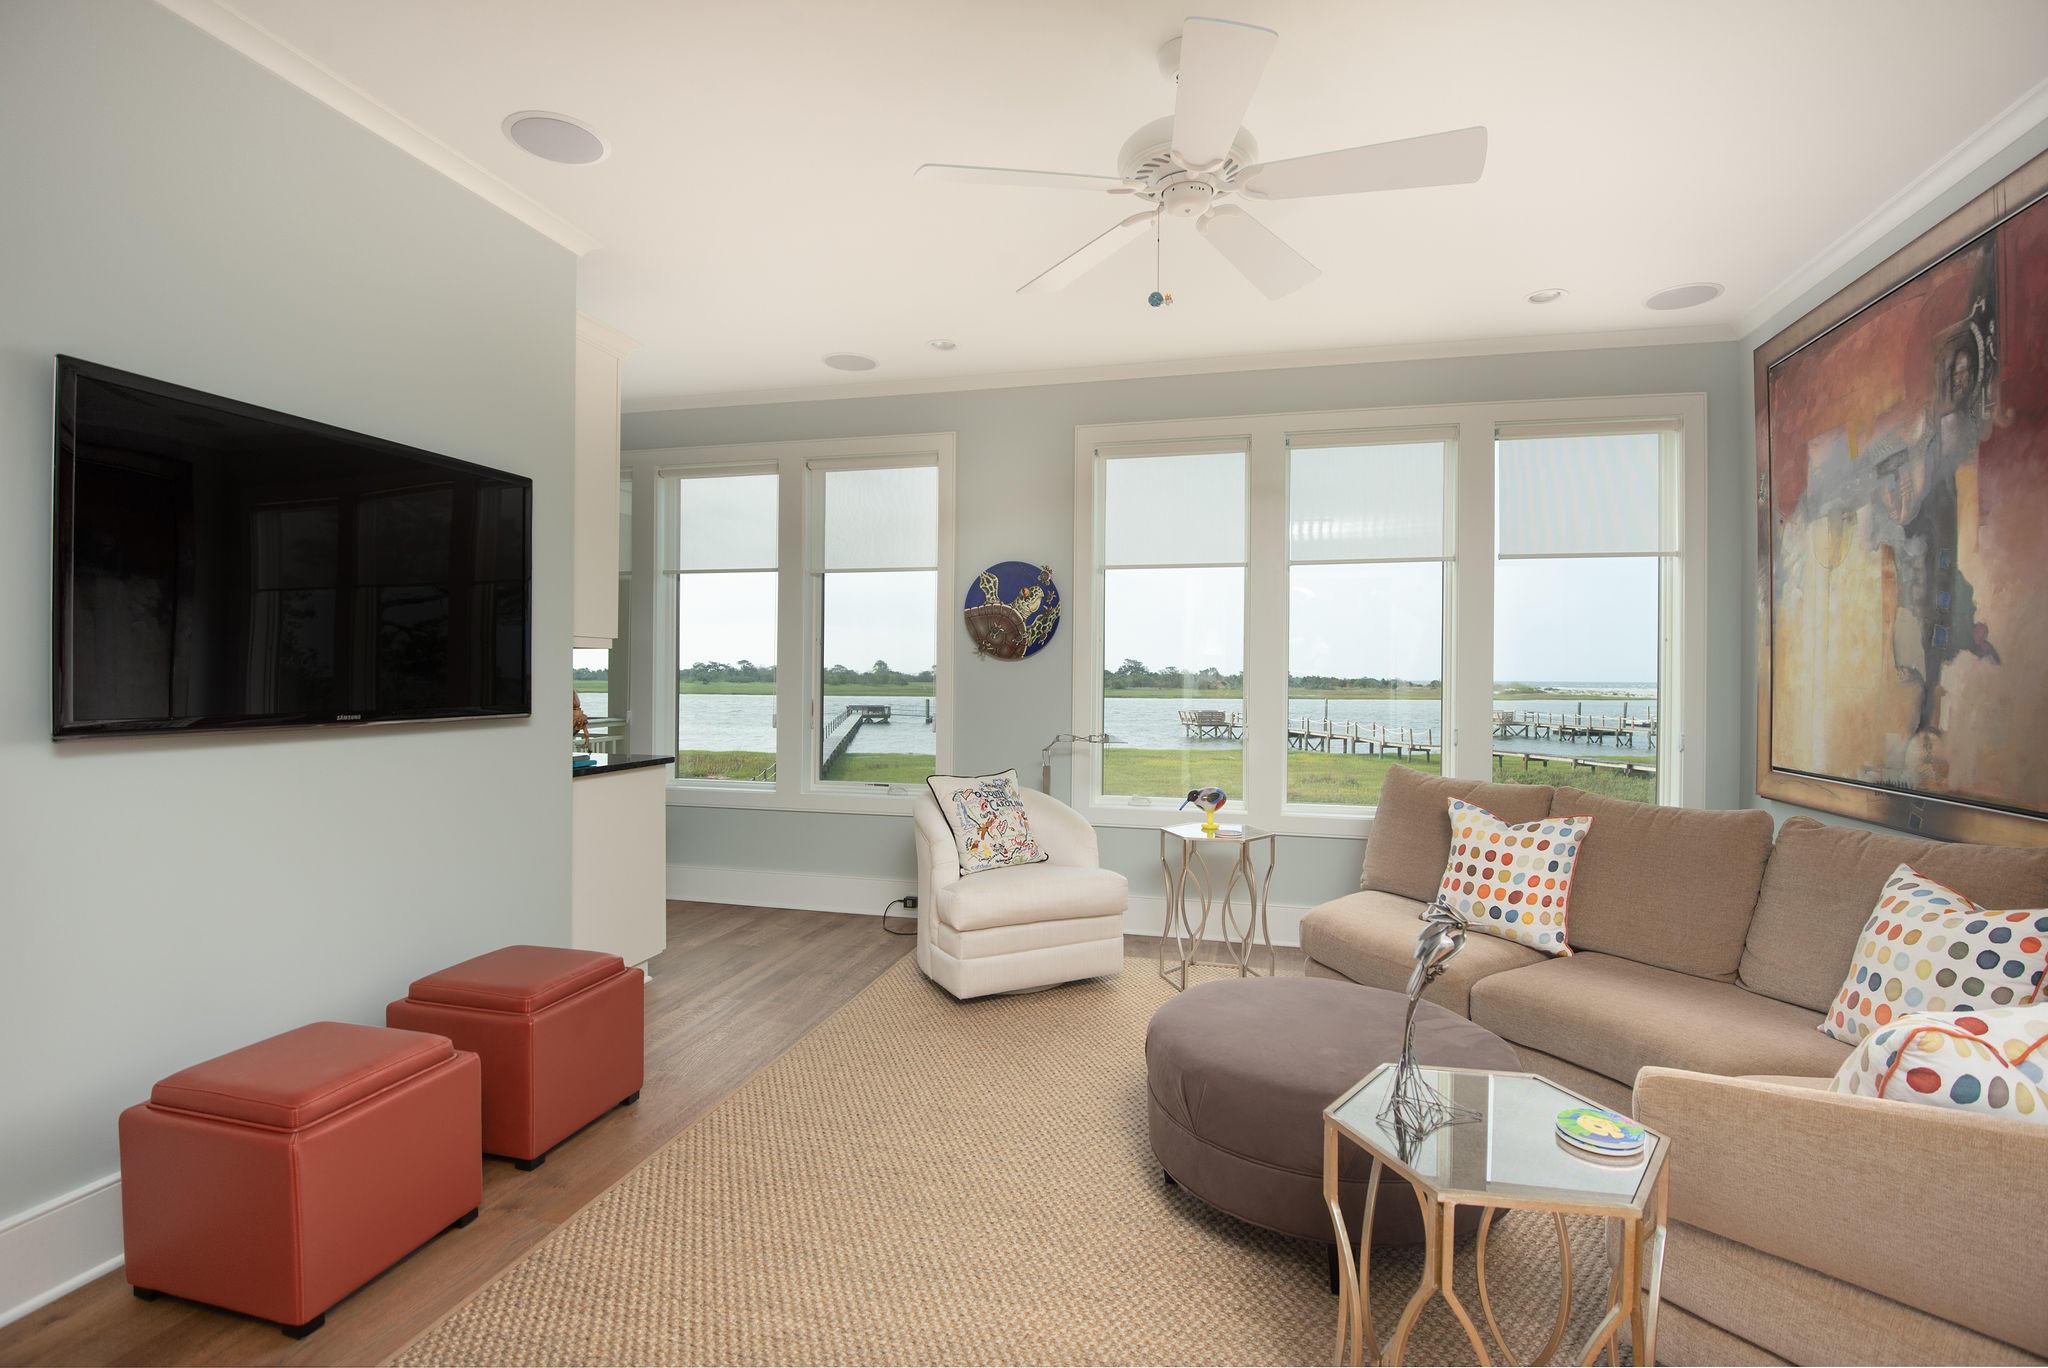 Seabrook Island Homes For Sale - 3135 Marshgate, Seabrook Island, SC - 32